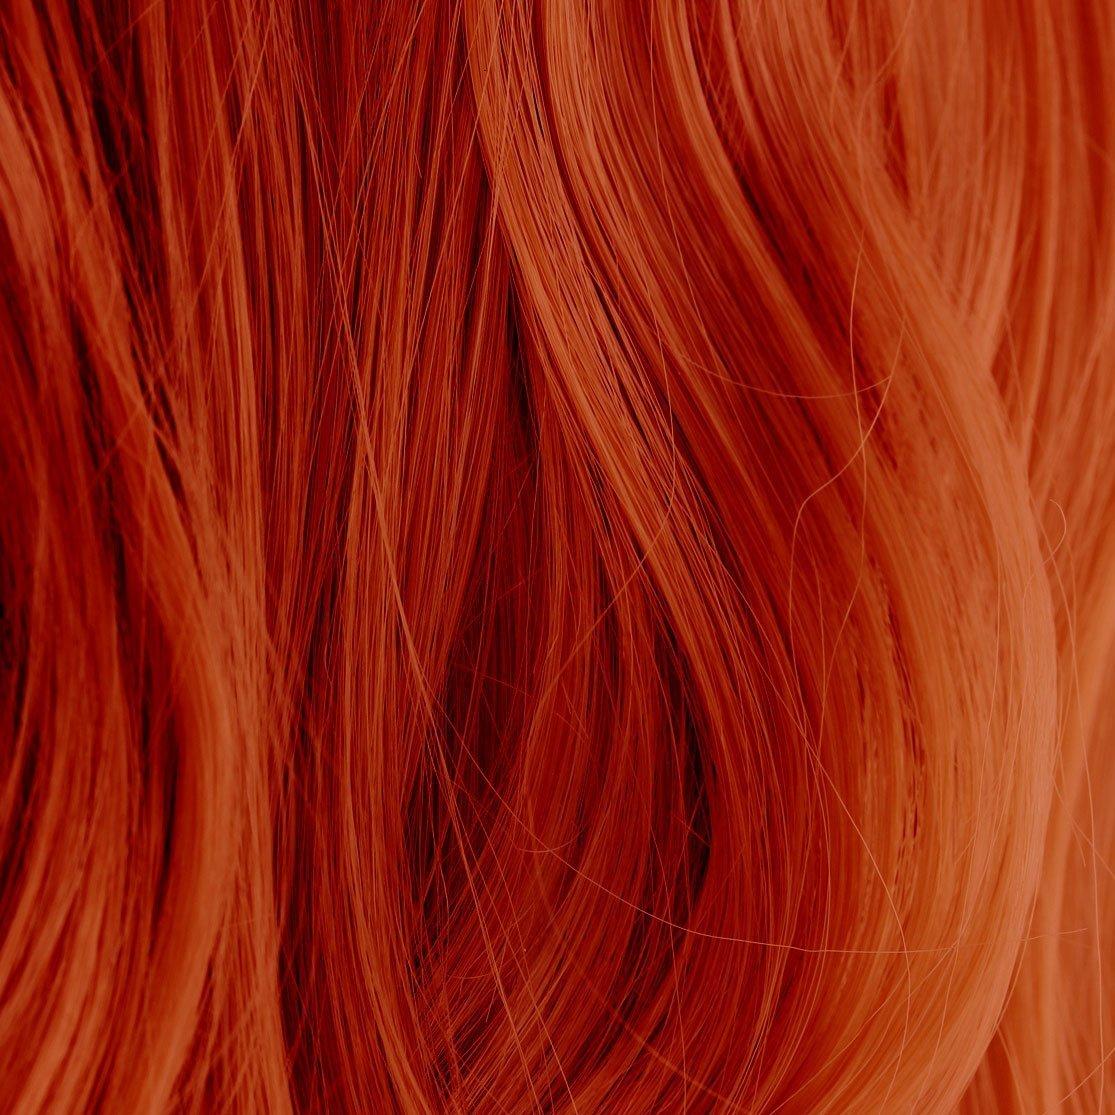 H&C 100% Natural and Pure Henna Powder / Lawsonia Inermis (Organically Grown) 227 gms (1/2 LB) for Hair